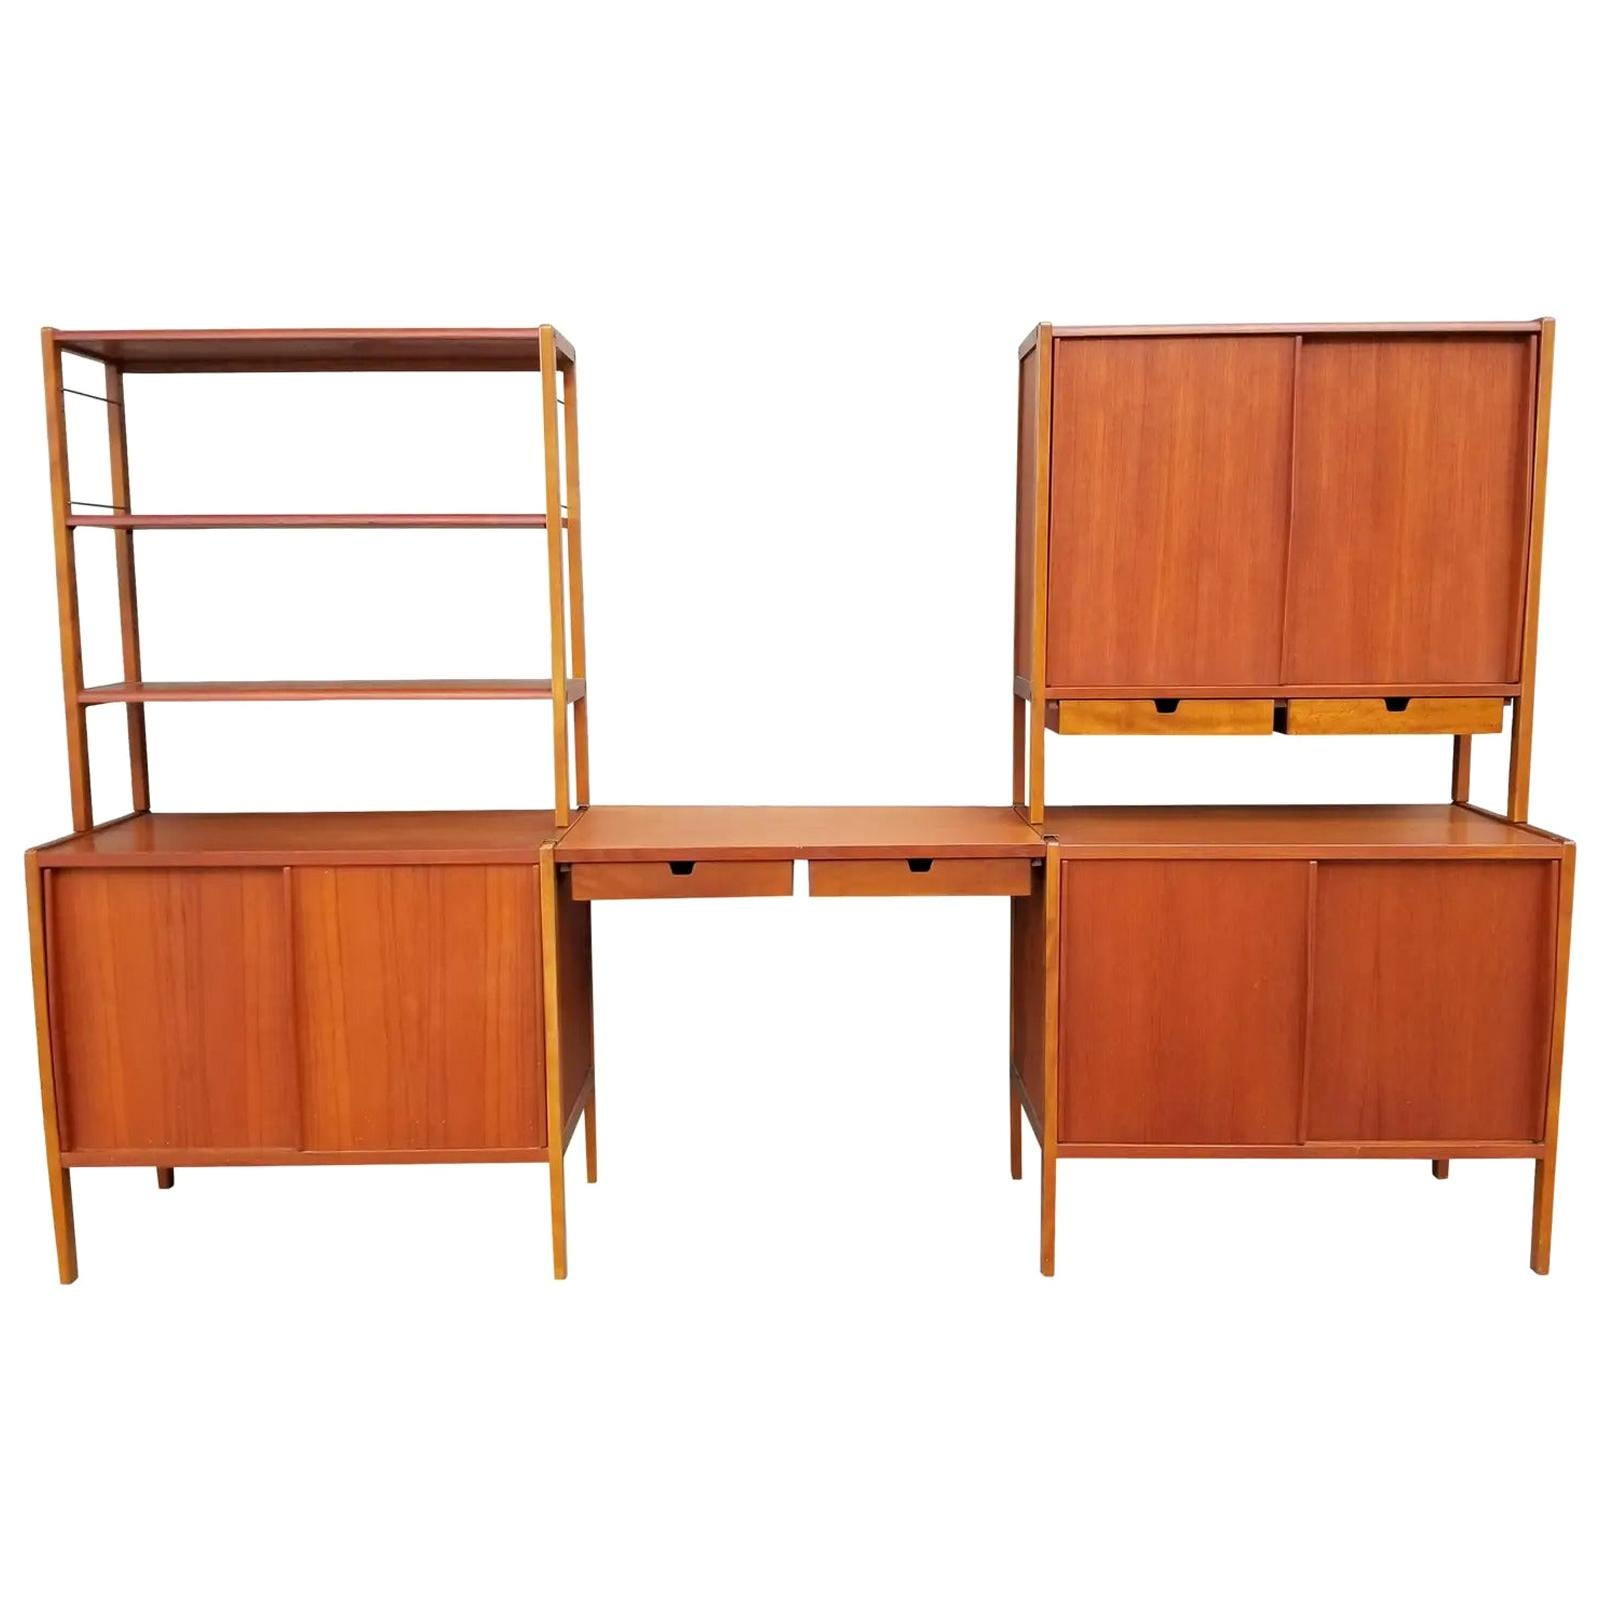 Dux Teak Danish Modern Storage / Shelf / Wall Unit